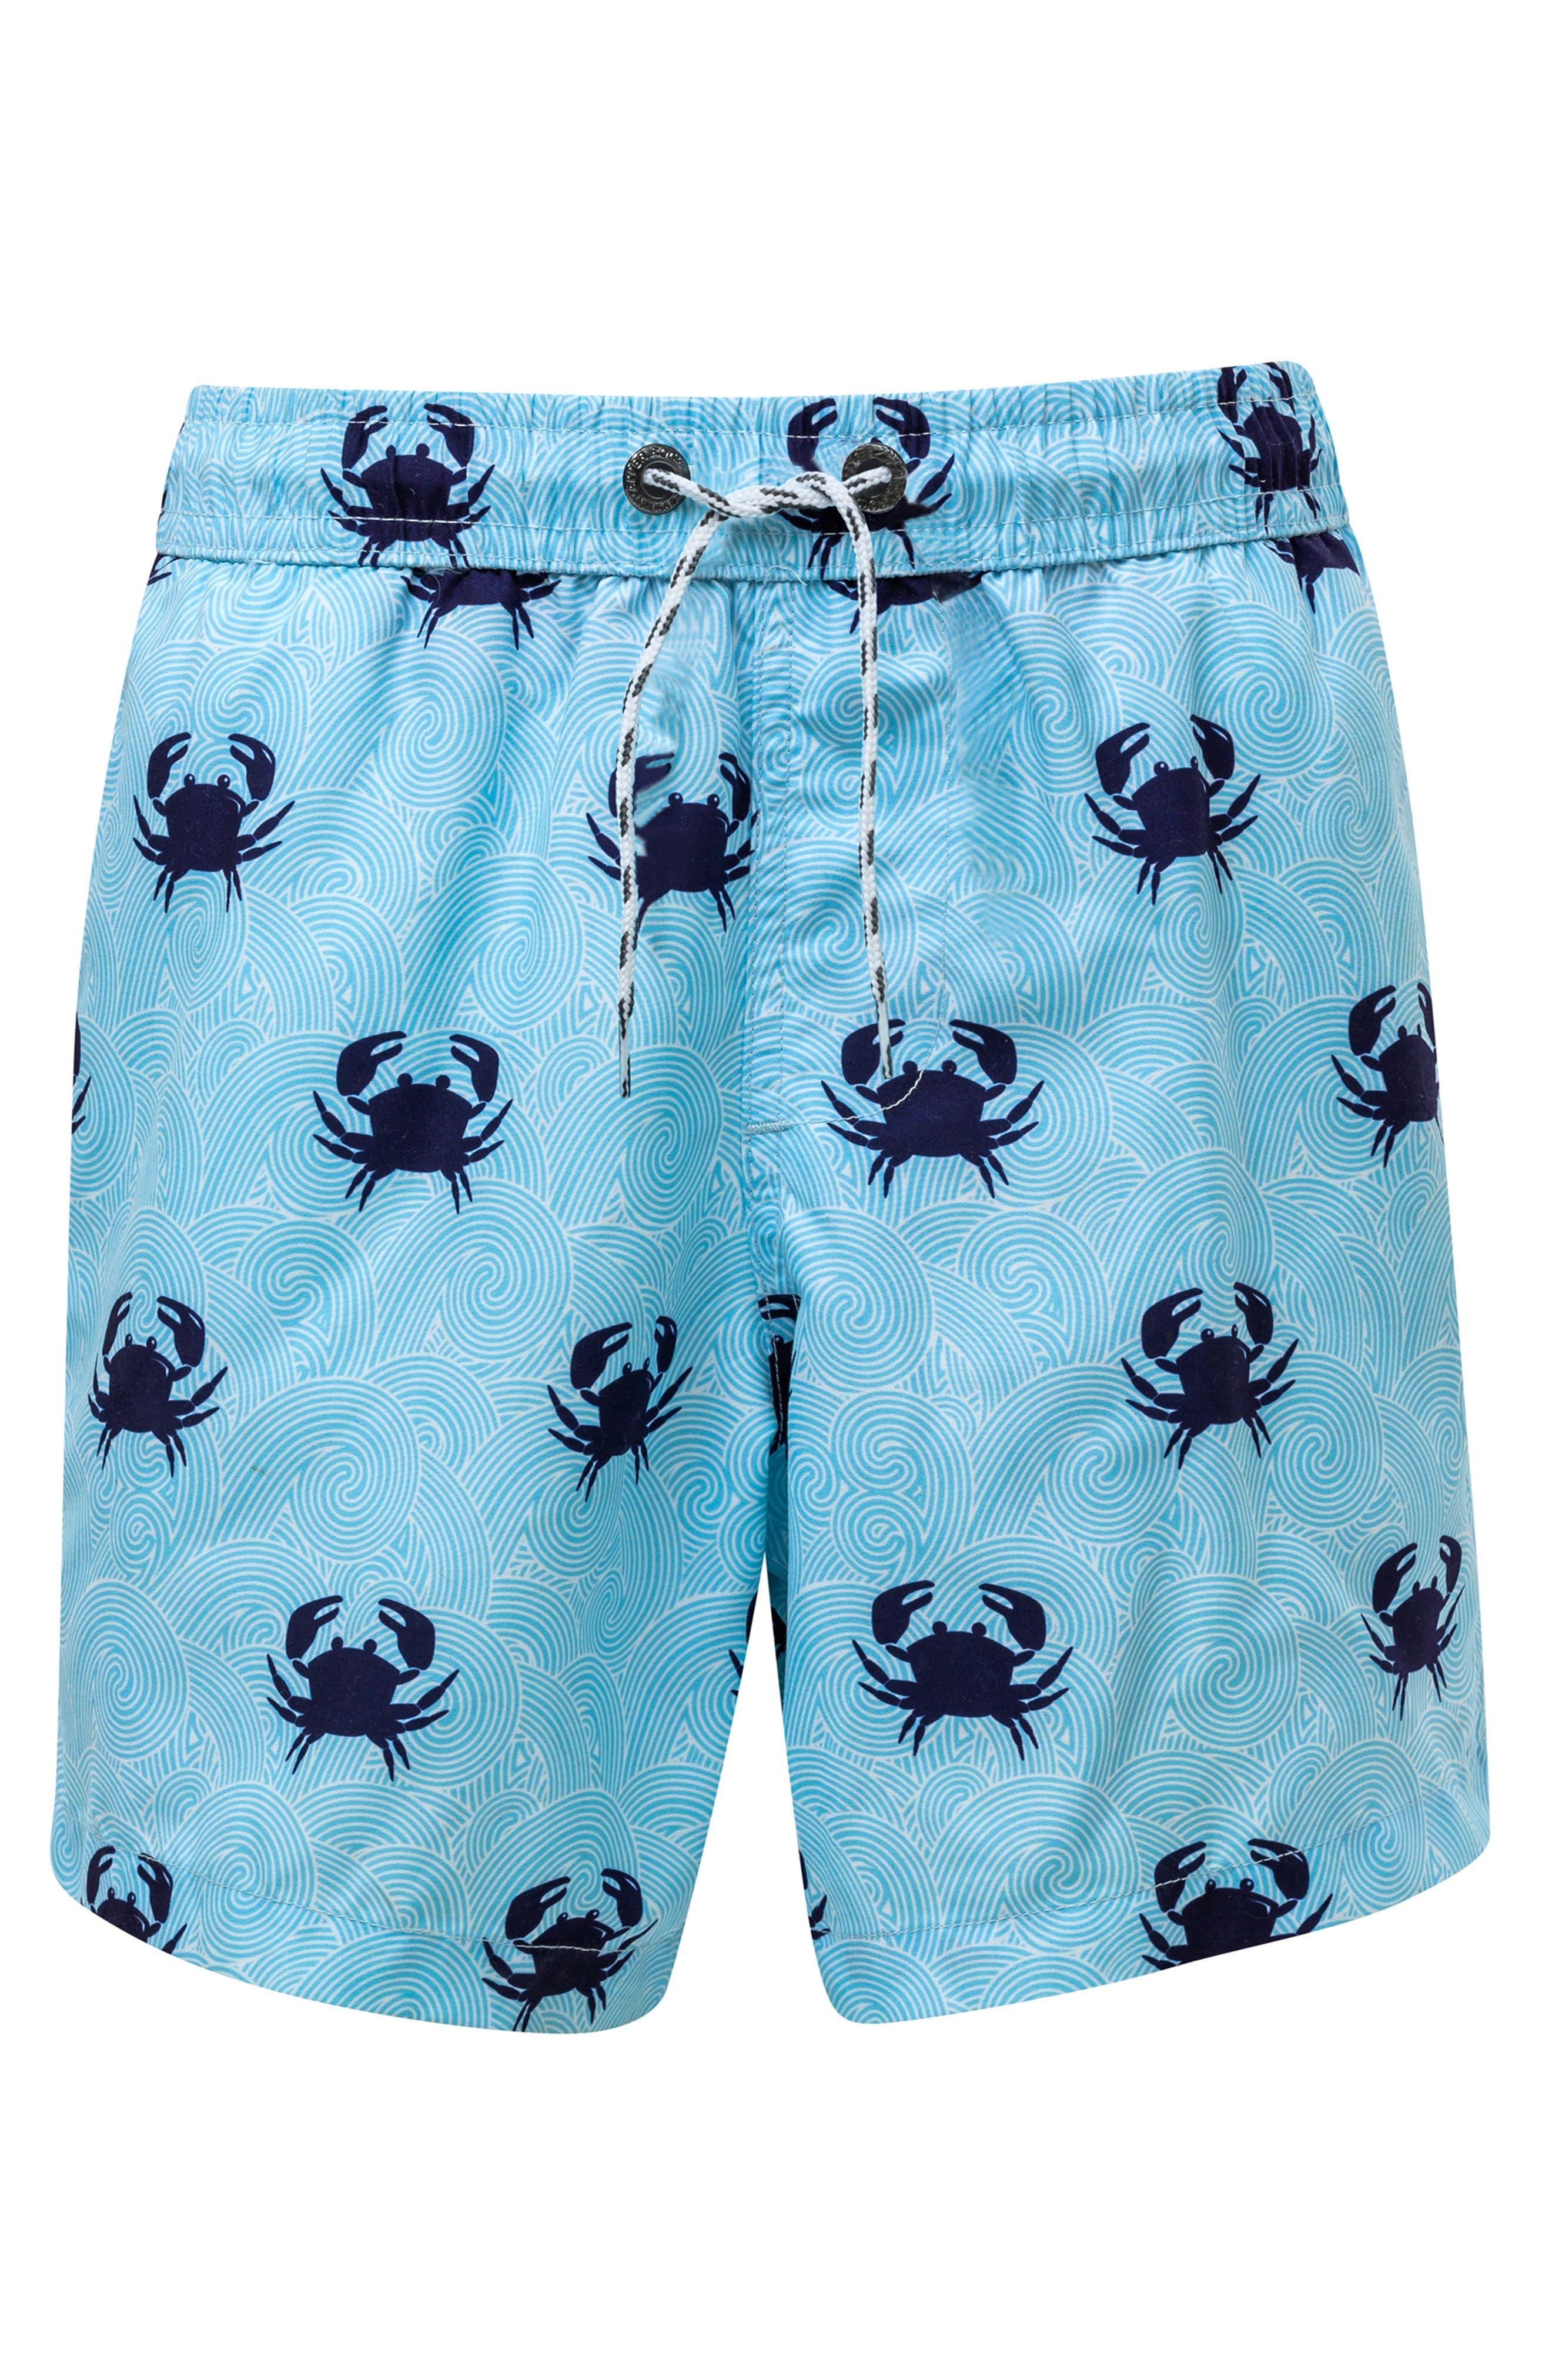 Blue Crab Swim Trunks, Main, color, LIGHT PASTEL BLUE